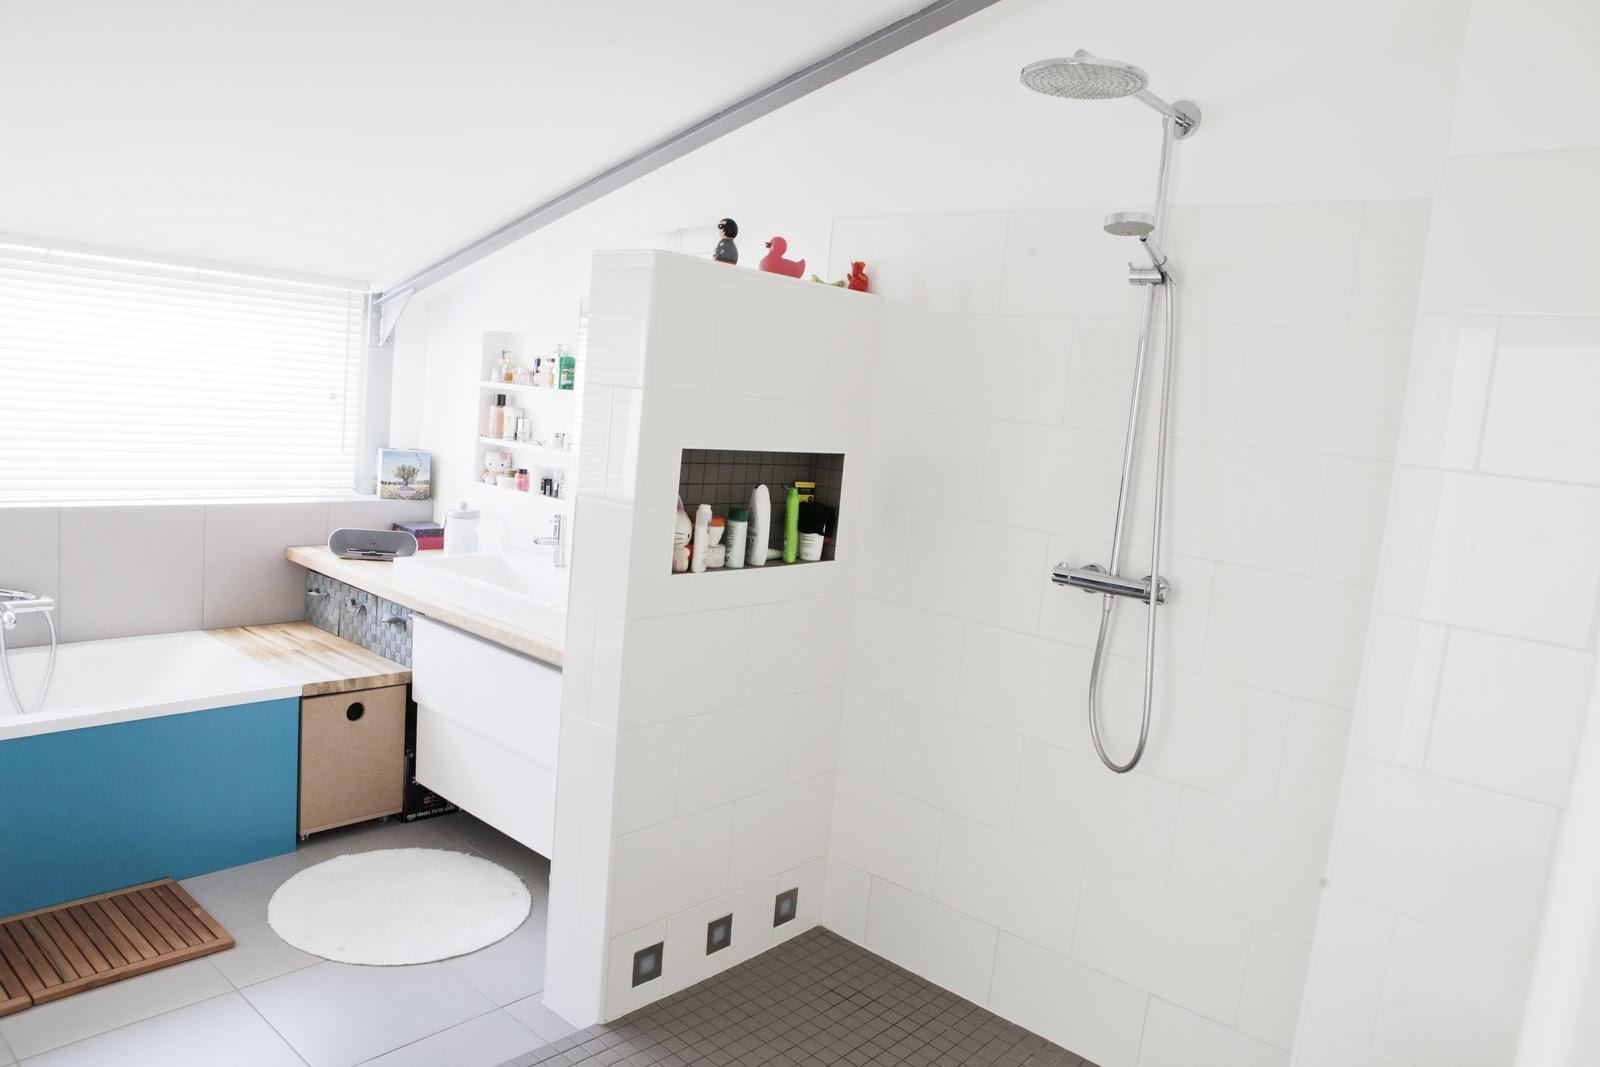 Hygi ne de l 39 est la transformation salle de bain for Salle de bain hygena